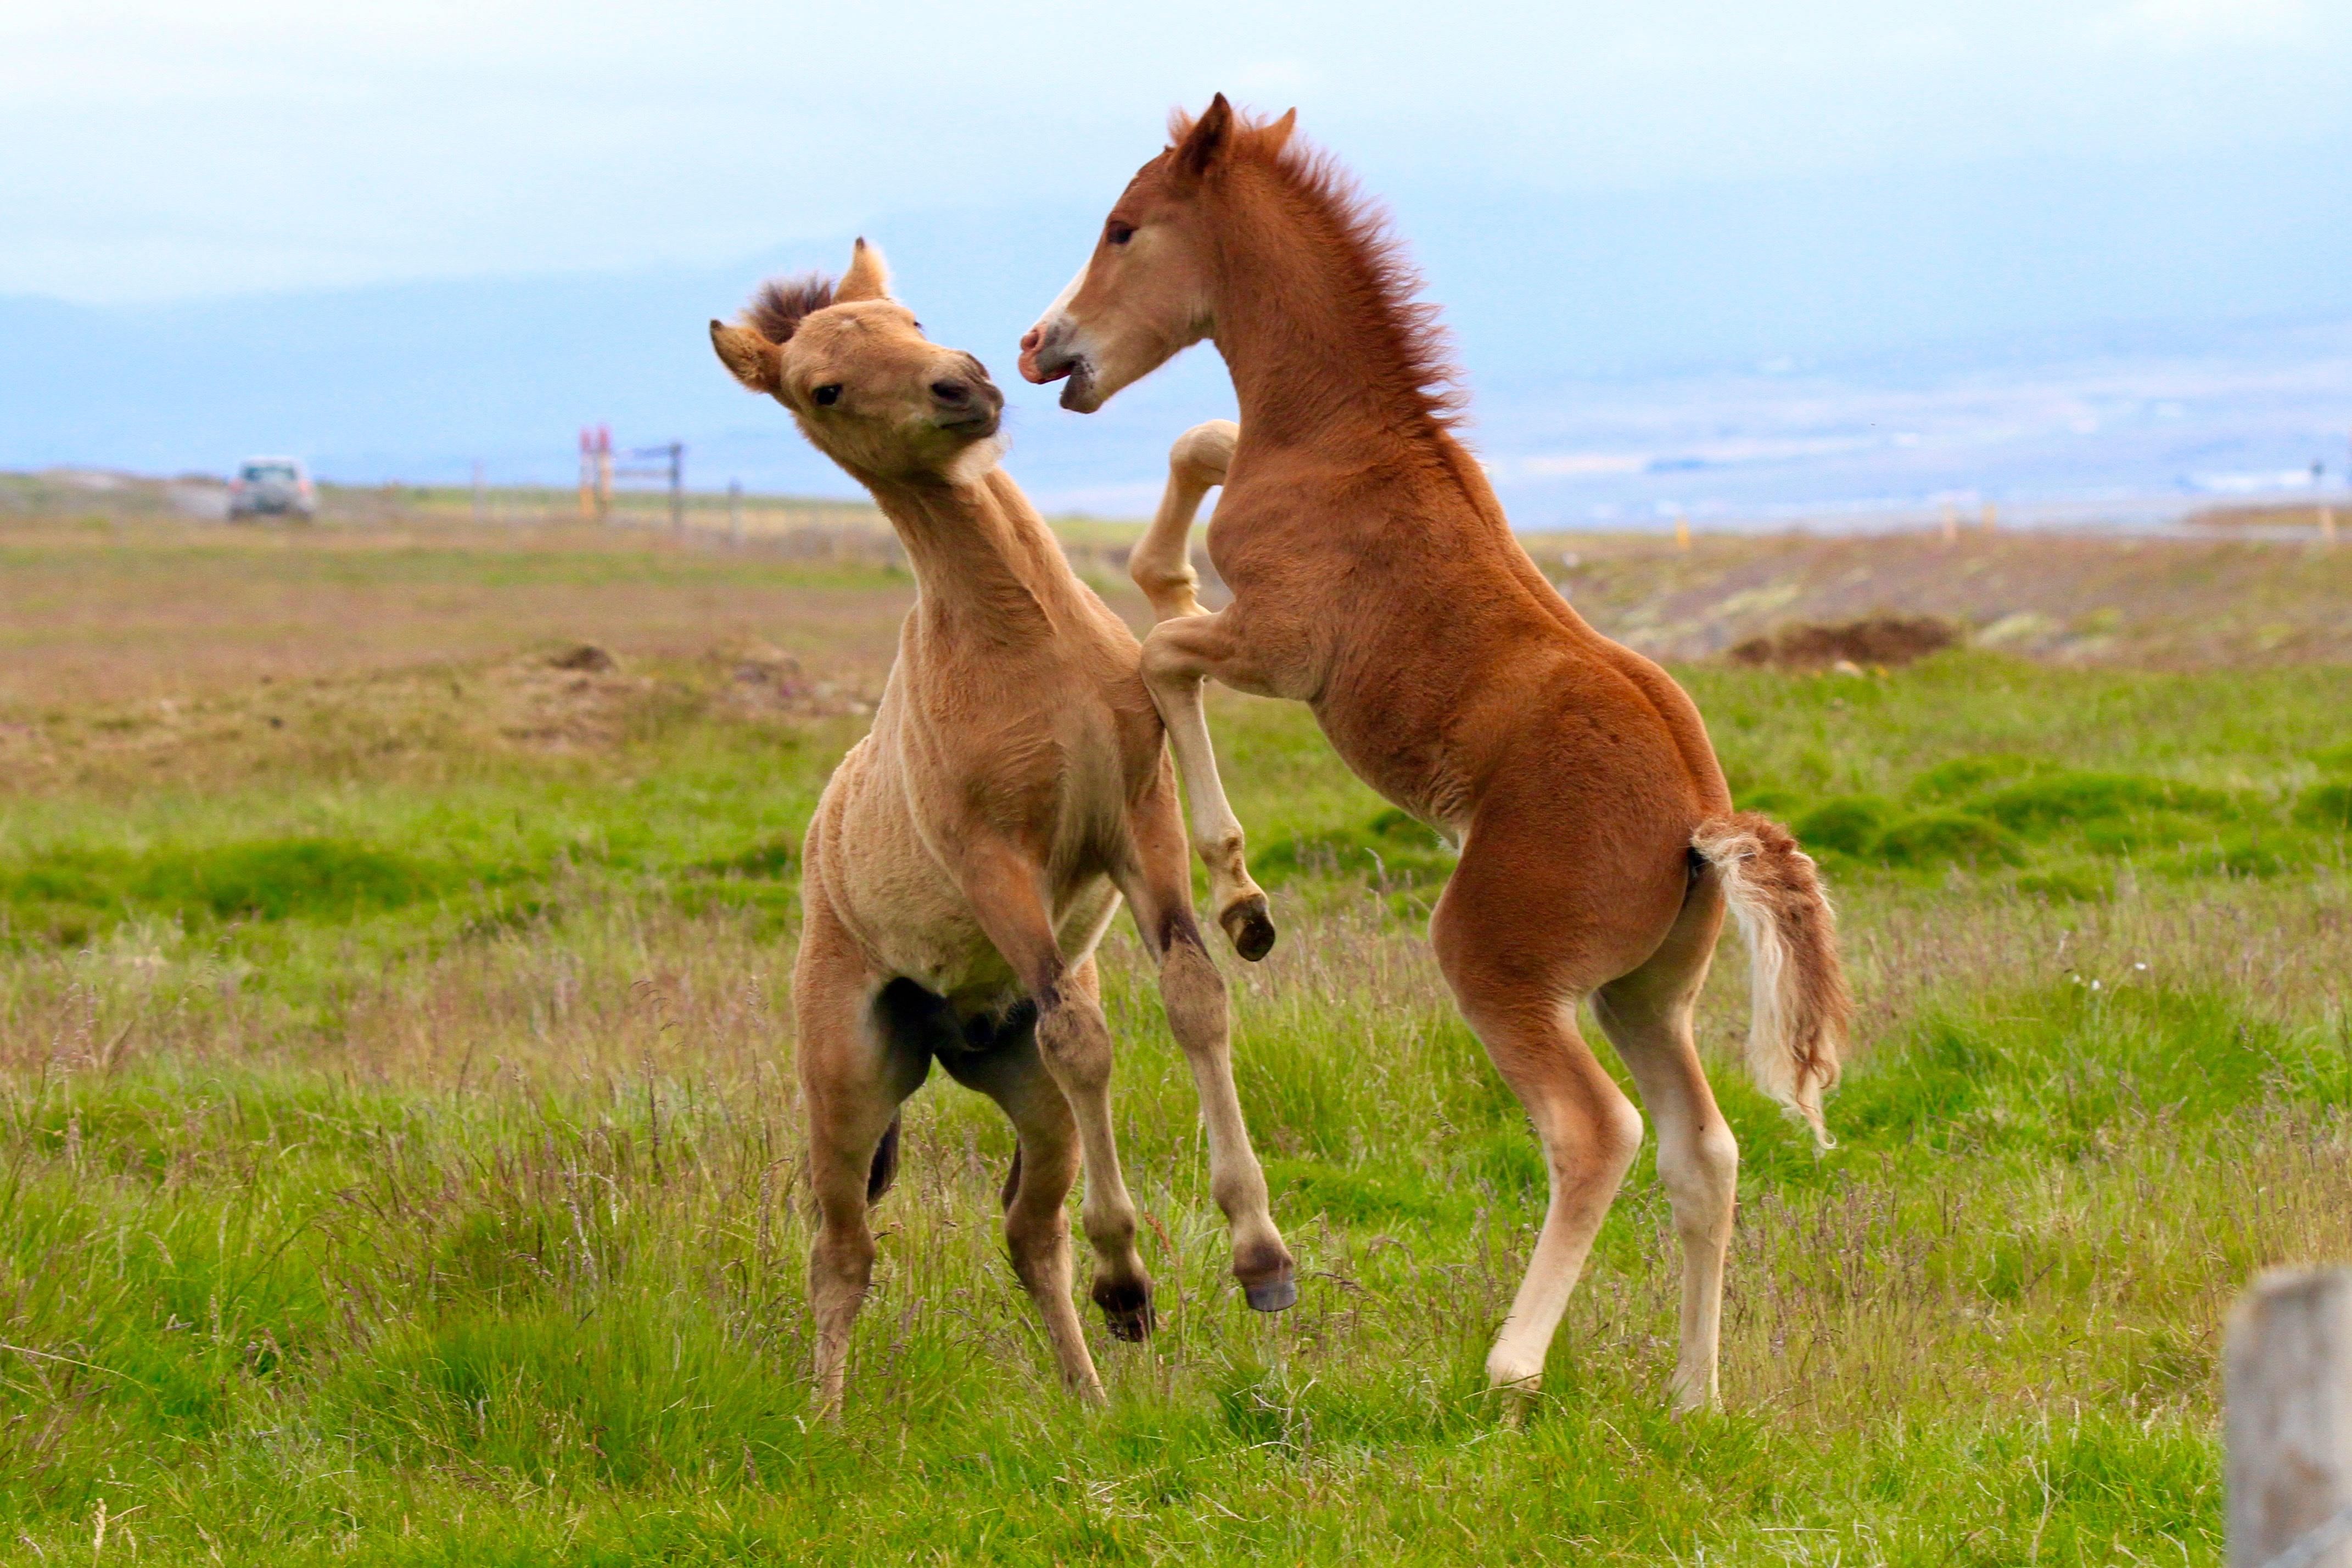 Island, Nordisland, Islandpferde, Pferde, Fohlen, Tiere, 2015